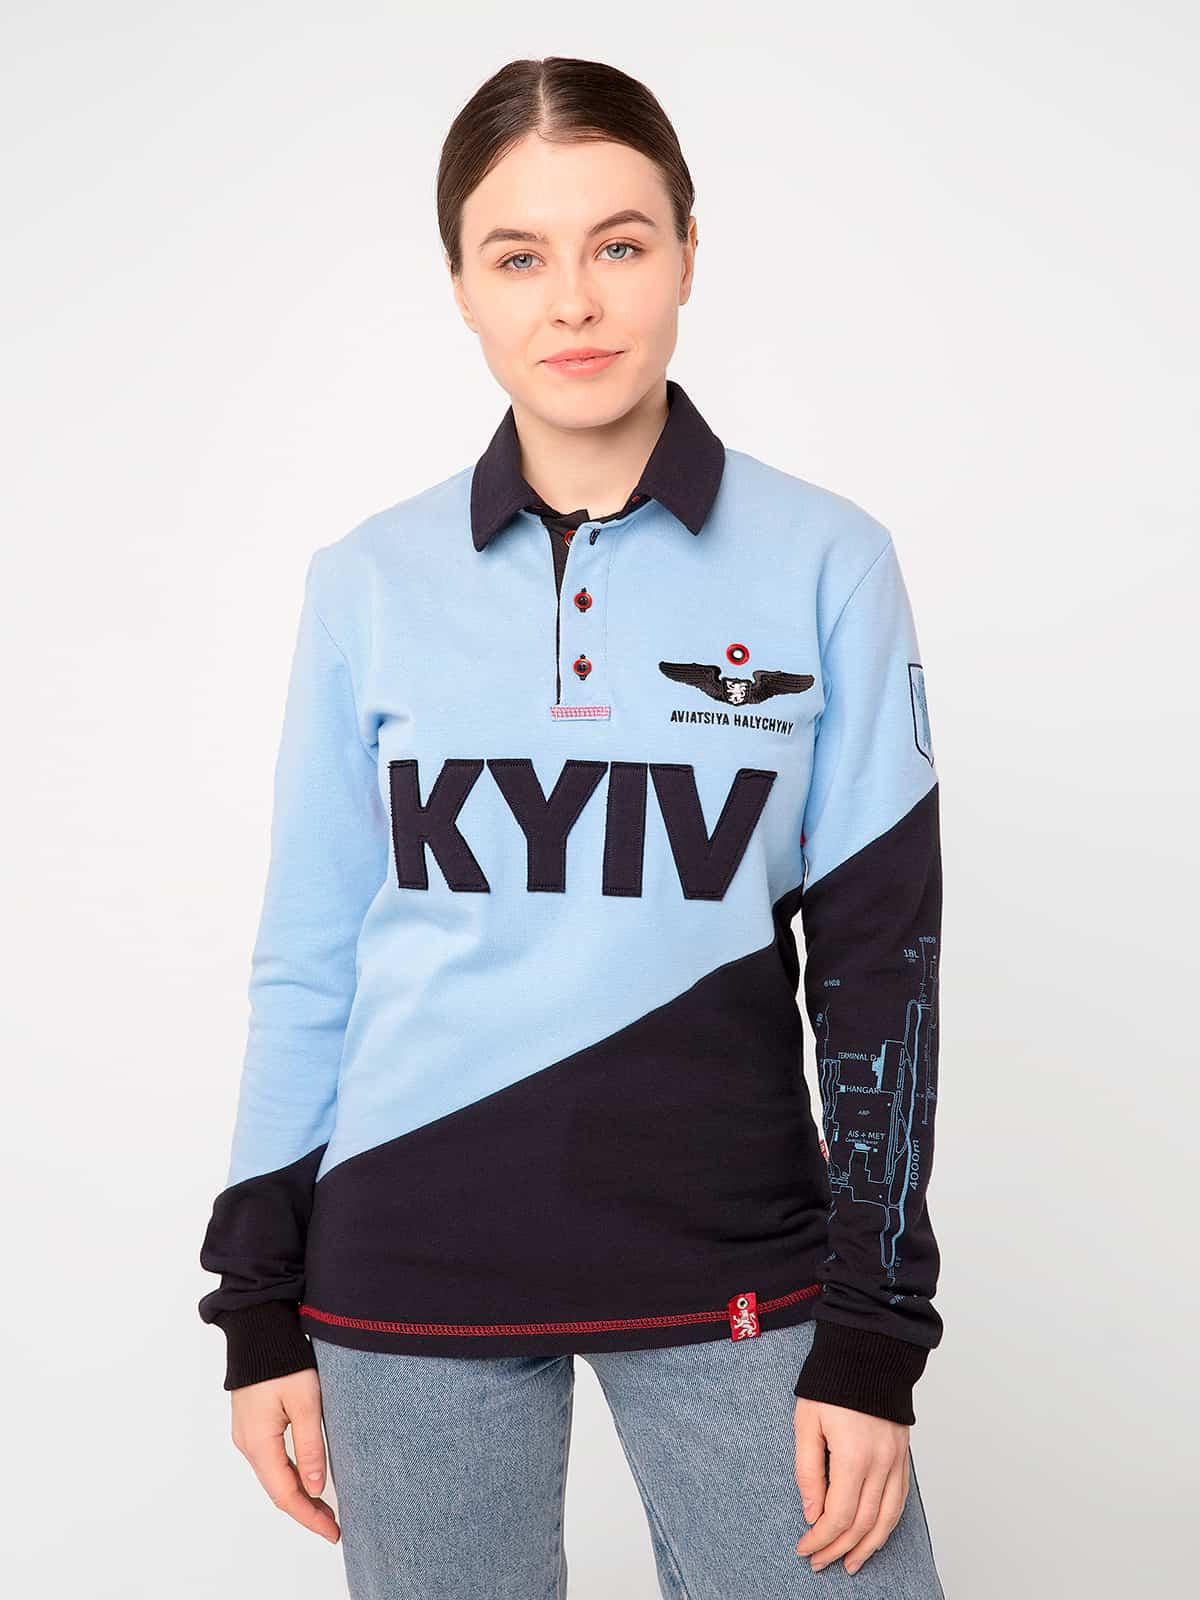 Women's Polo Long Kyiv. Color sky blue. Unisex polo long (men's sizes).